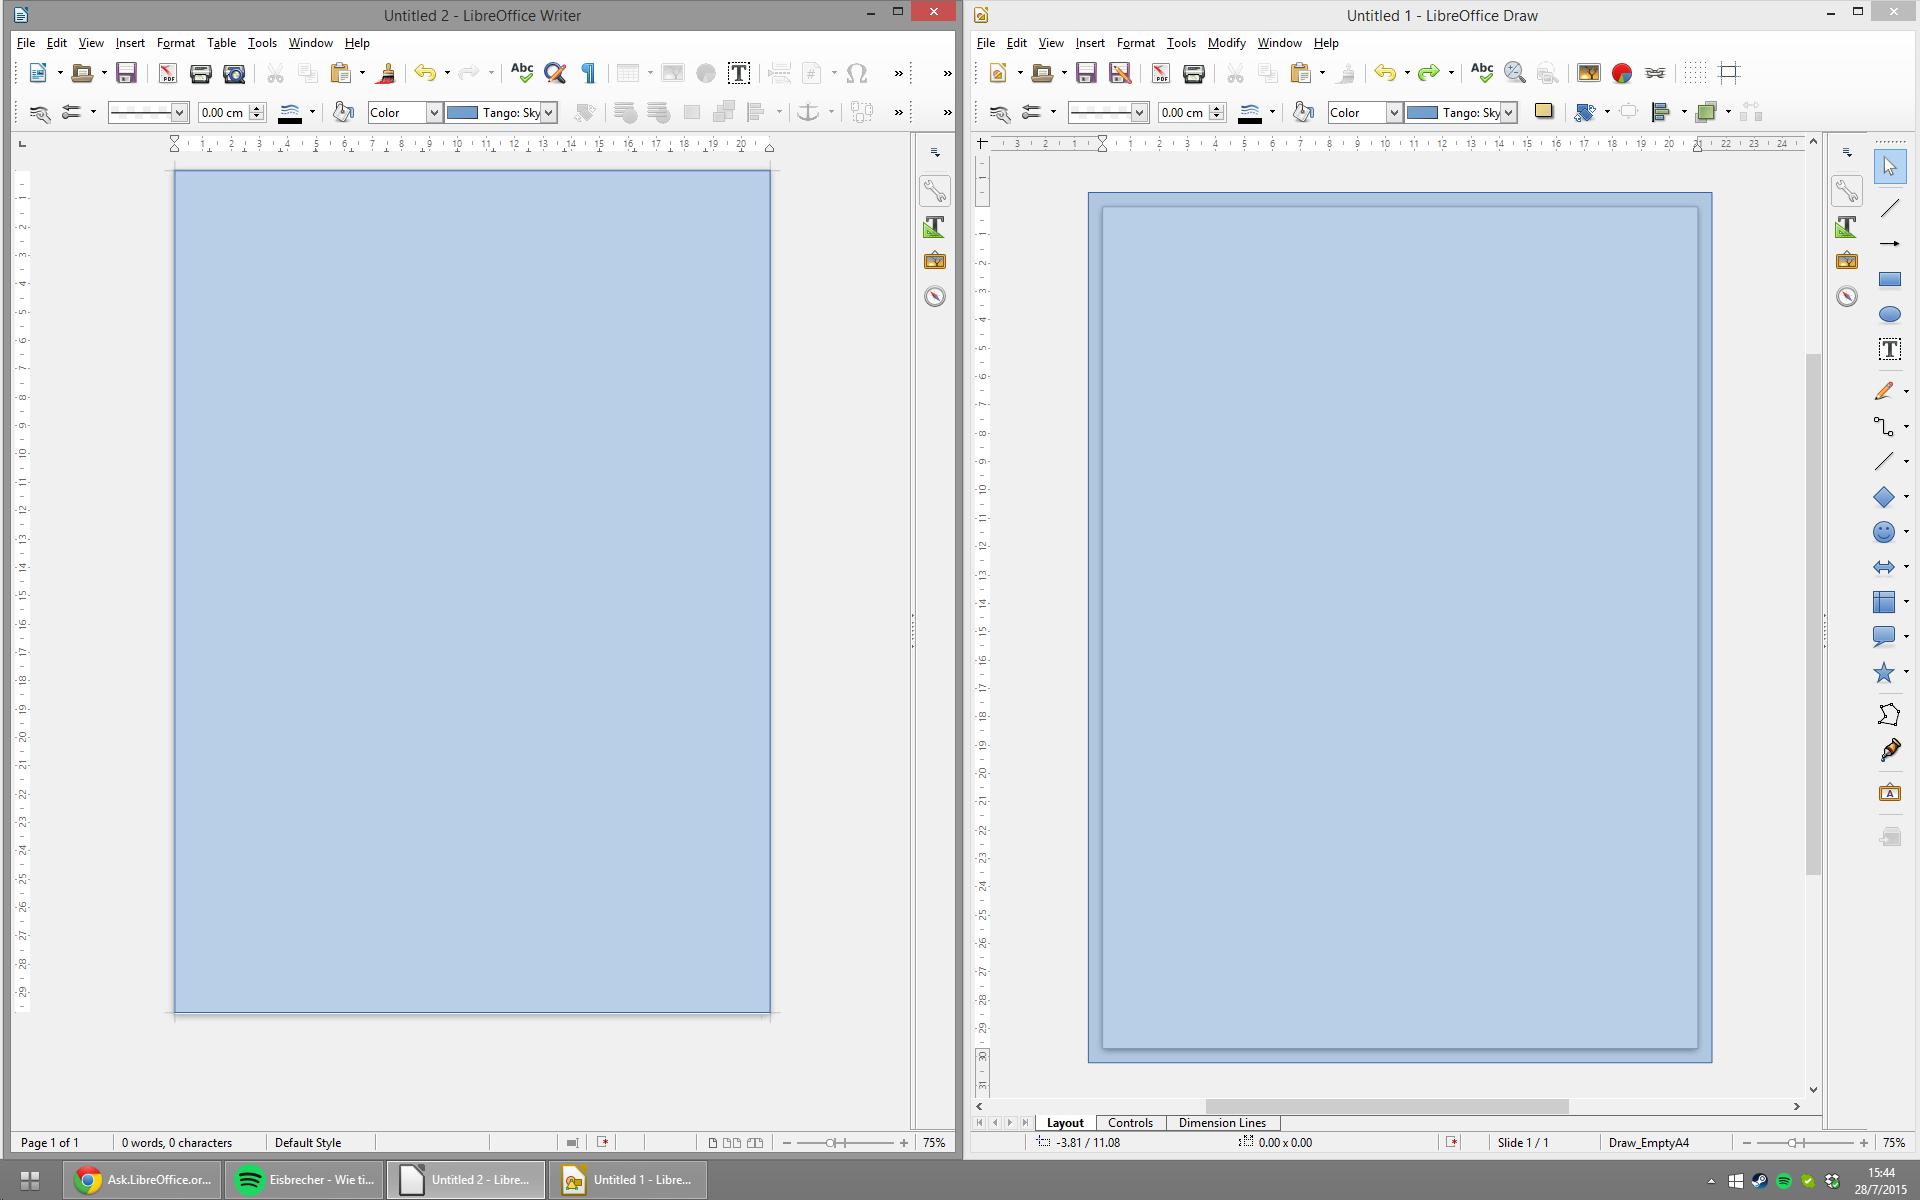 printbleed Writer vs Draw